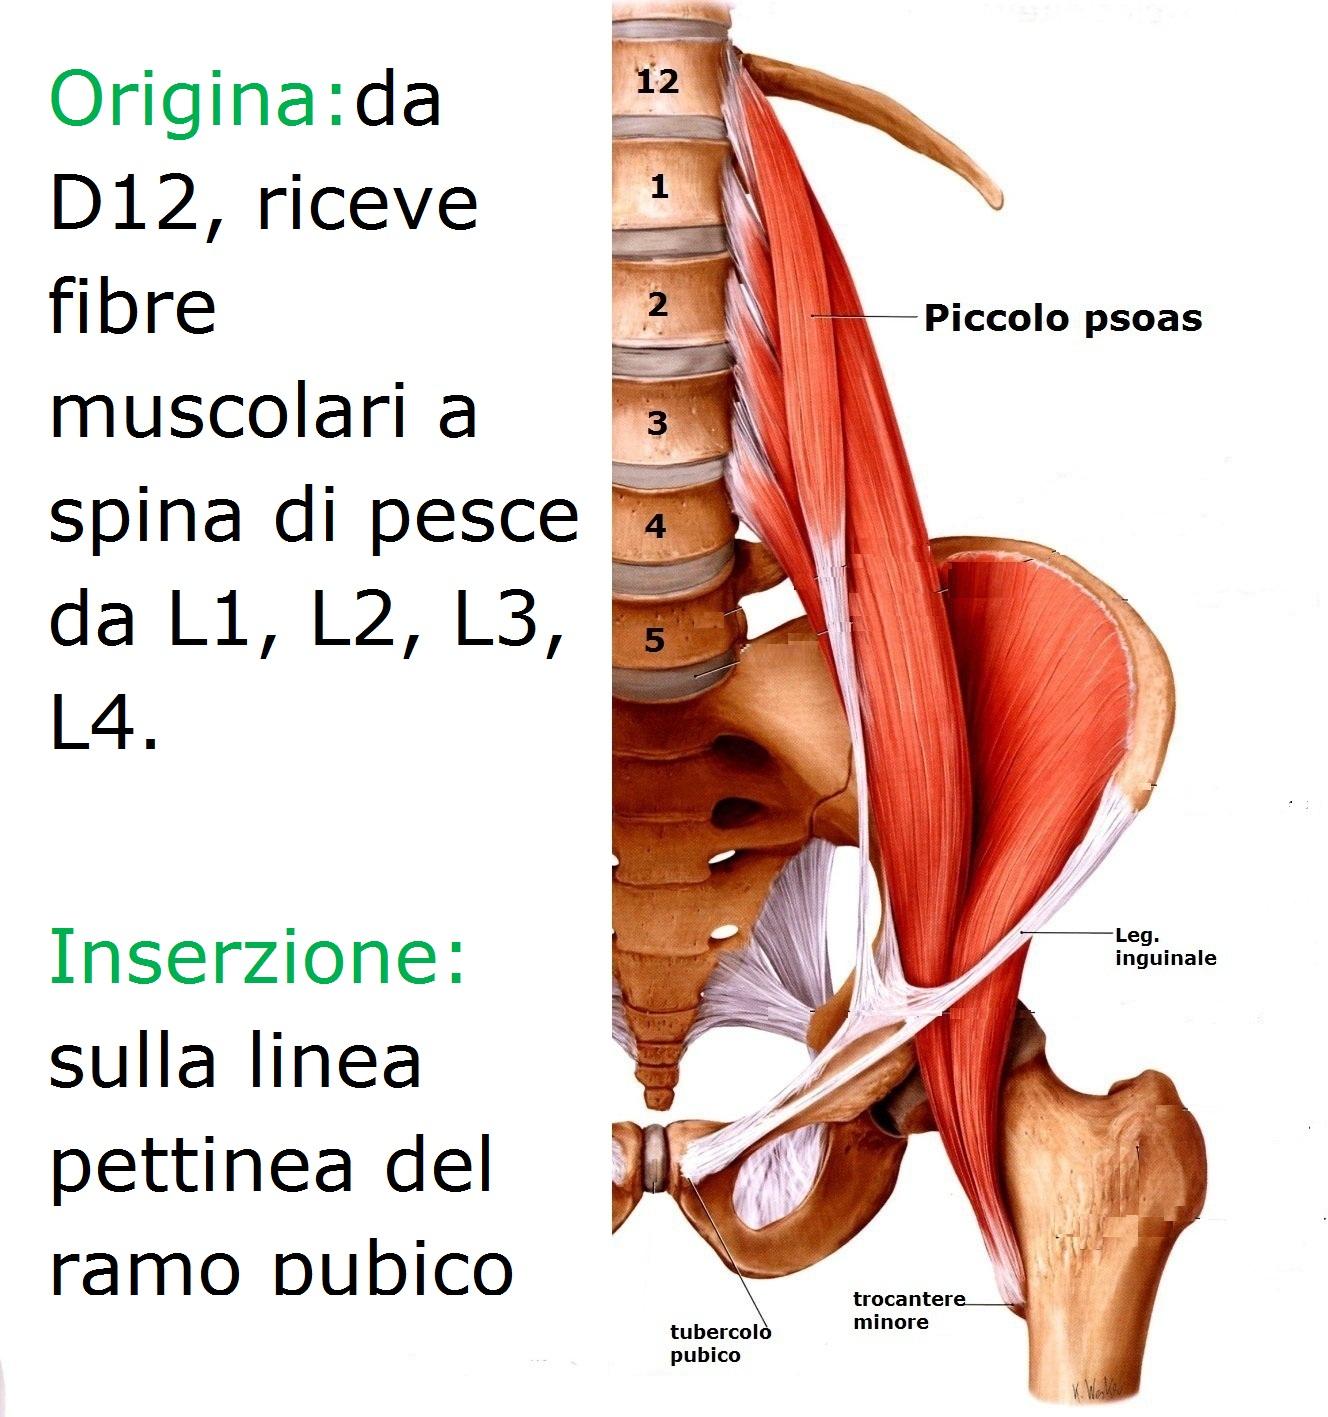 Iliaco e psoas muscolo